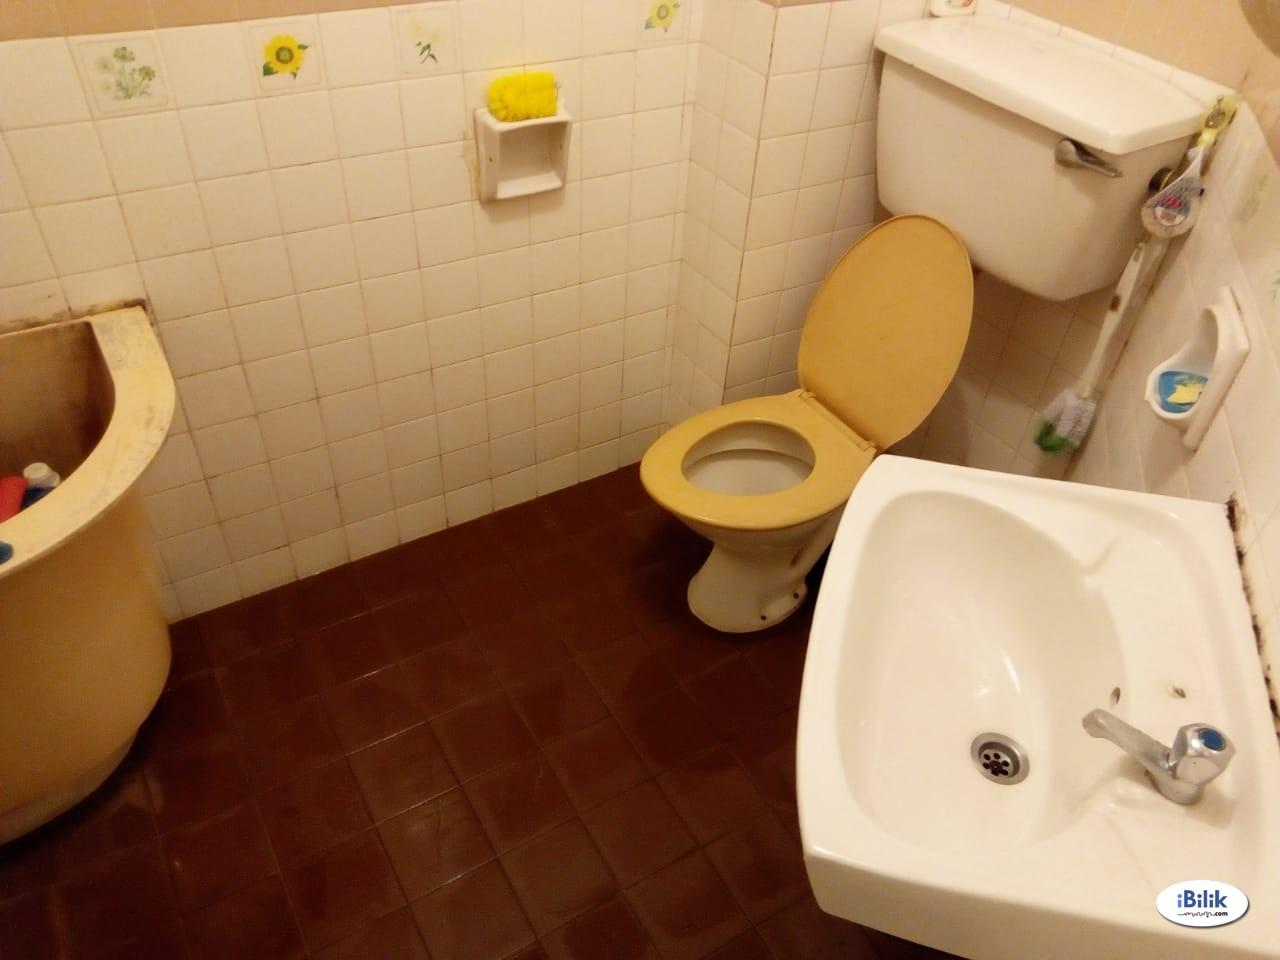 Midium Room for rent near Kelana Jaya LRT, NOW